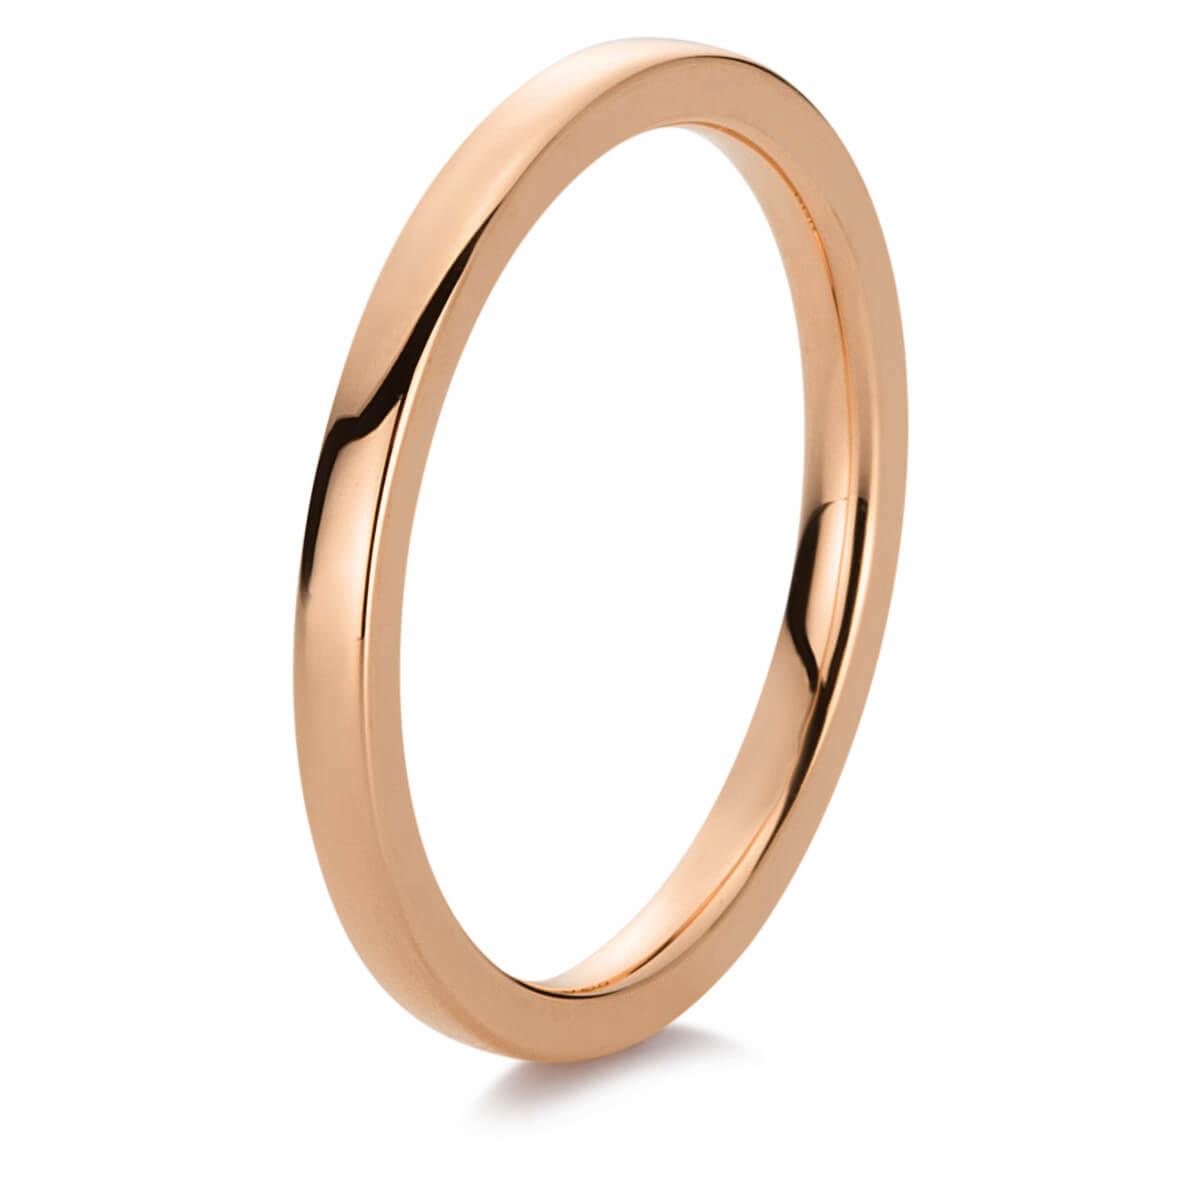 Ring Damenring Fingerring Kügelchen Breite 2,2mm 585 Gold Rotgold Goldring